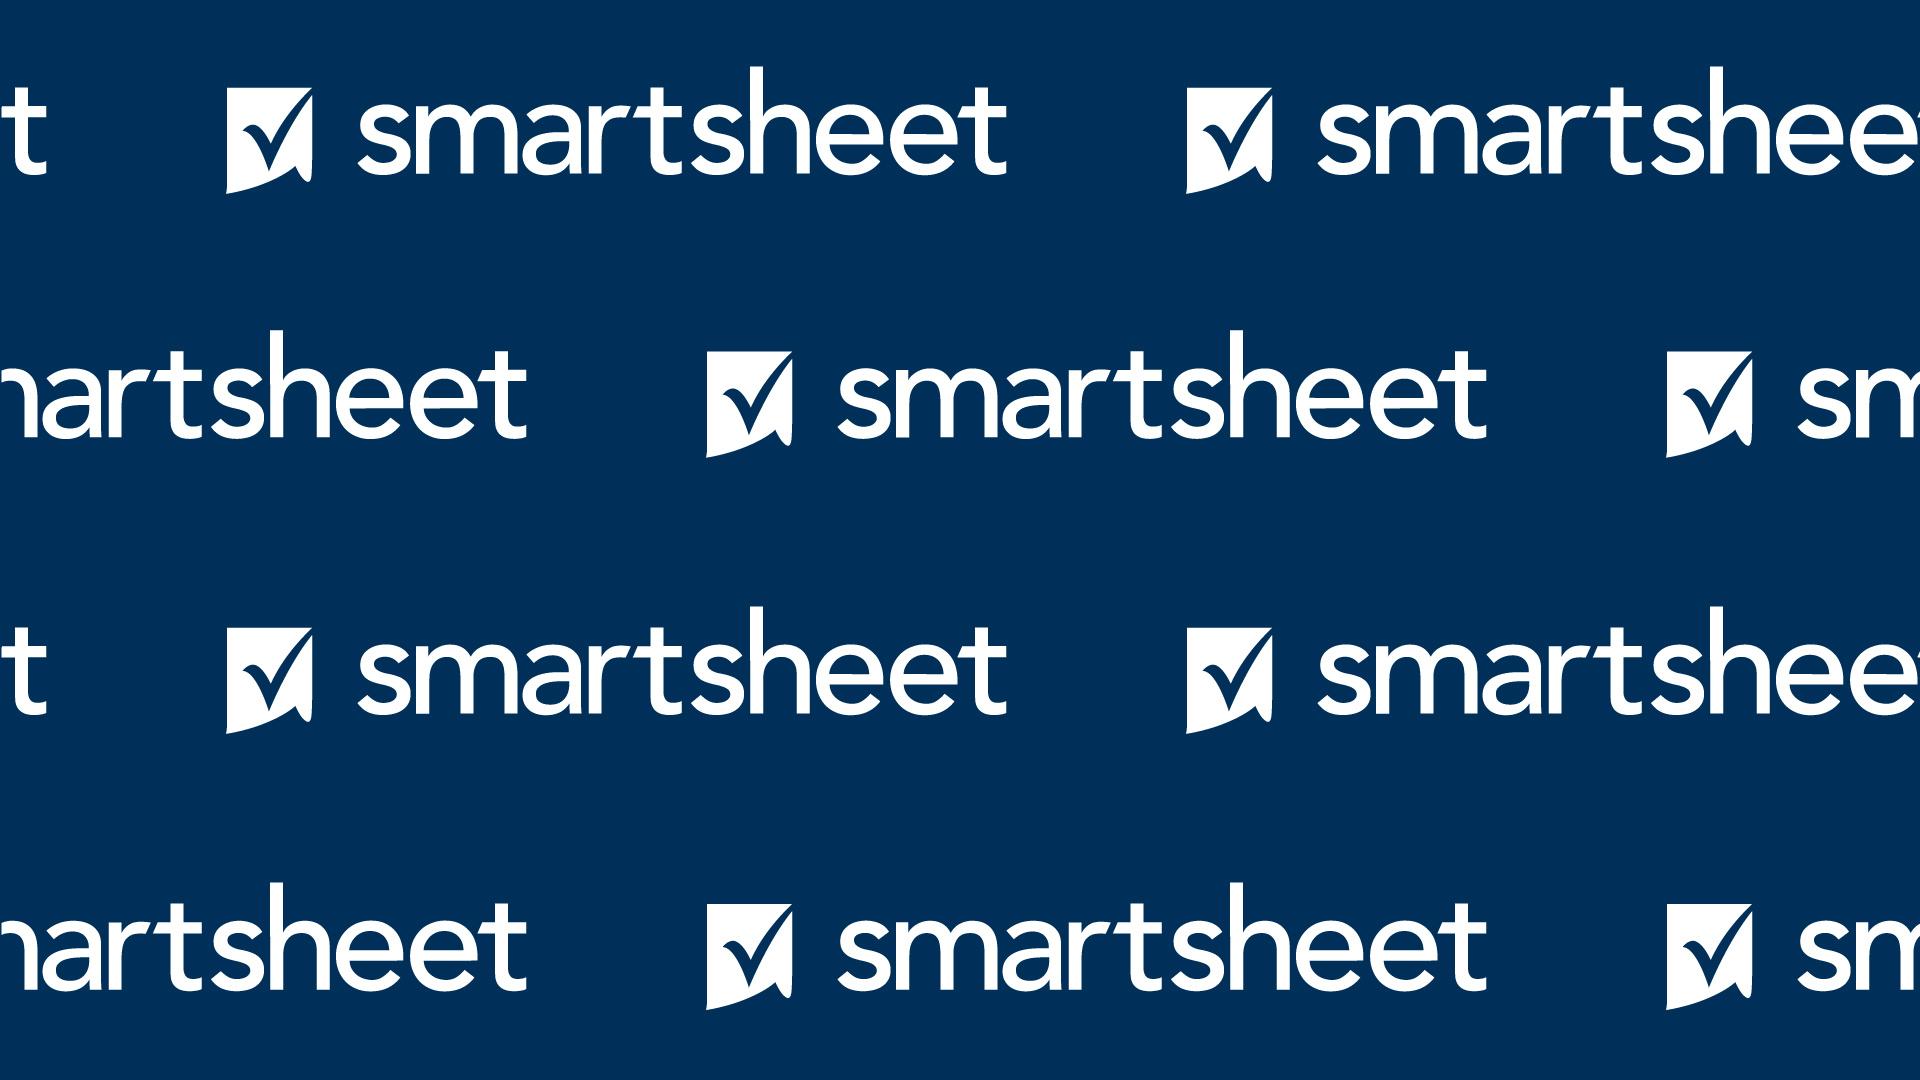 zoom-background-smartsheet-logo-pattern.jpg